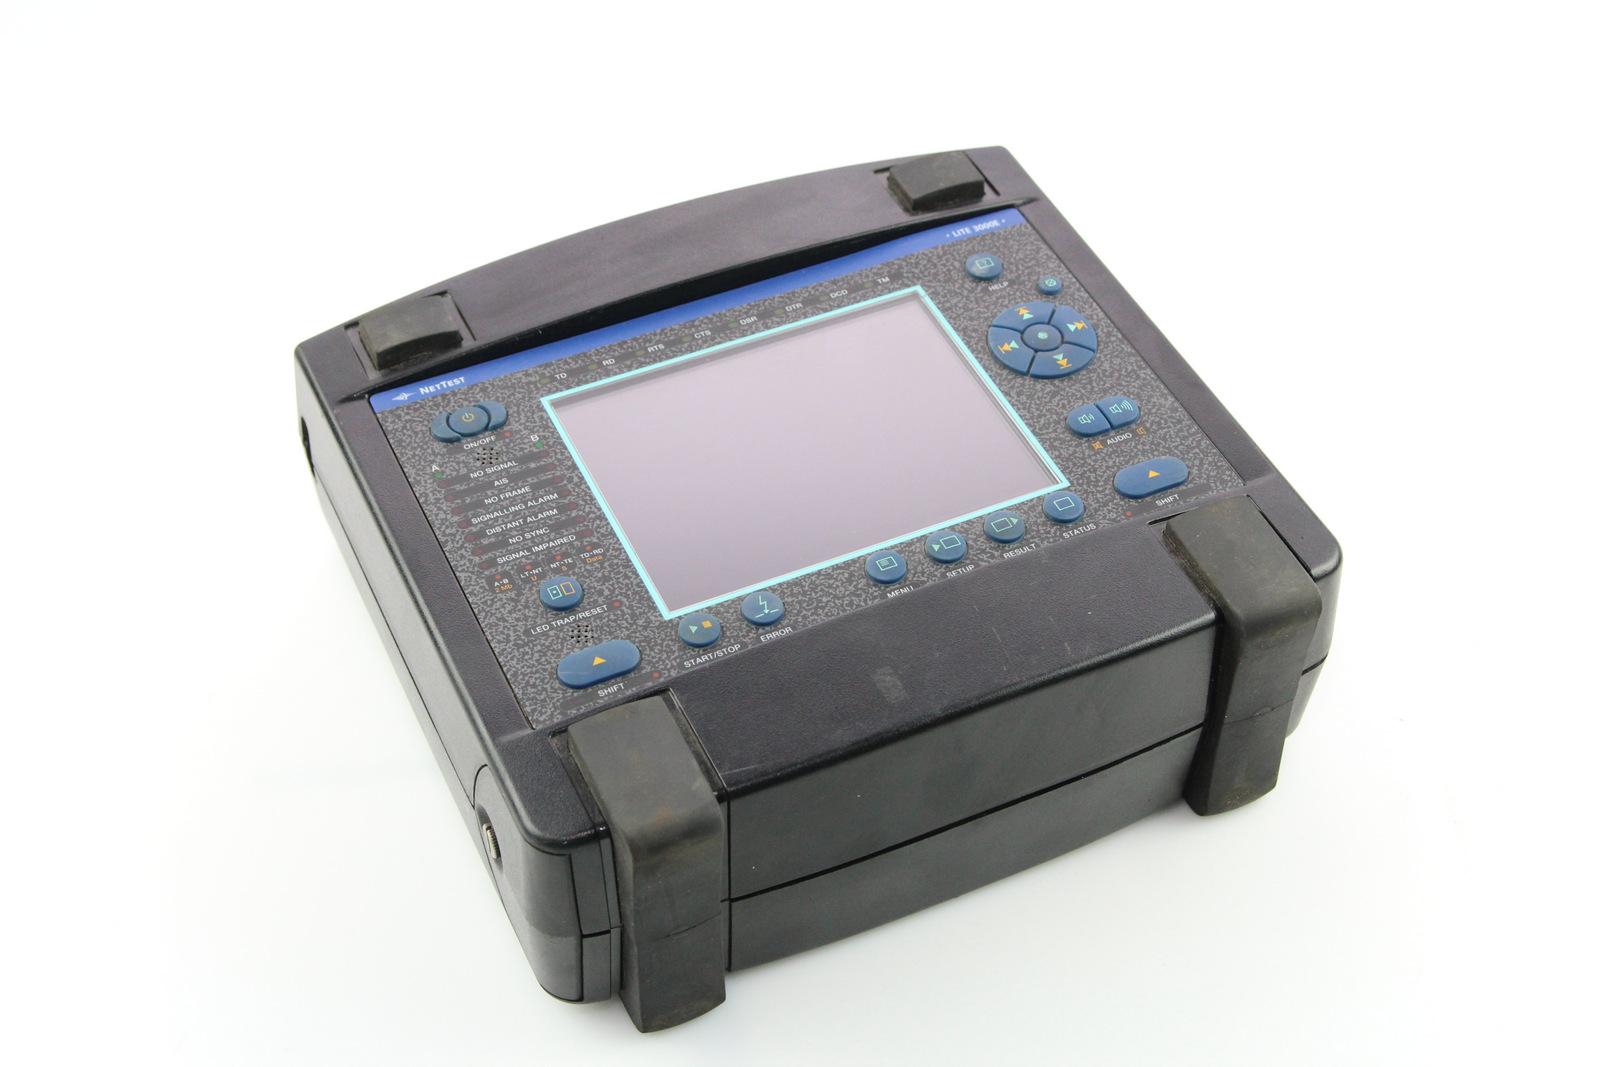 GN Nettest Lite 3000E GSM GPRS Mobile Network ISDN Telecom Analyzer